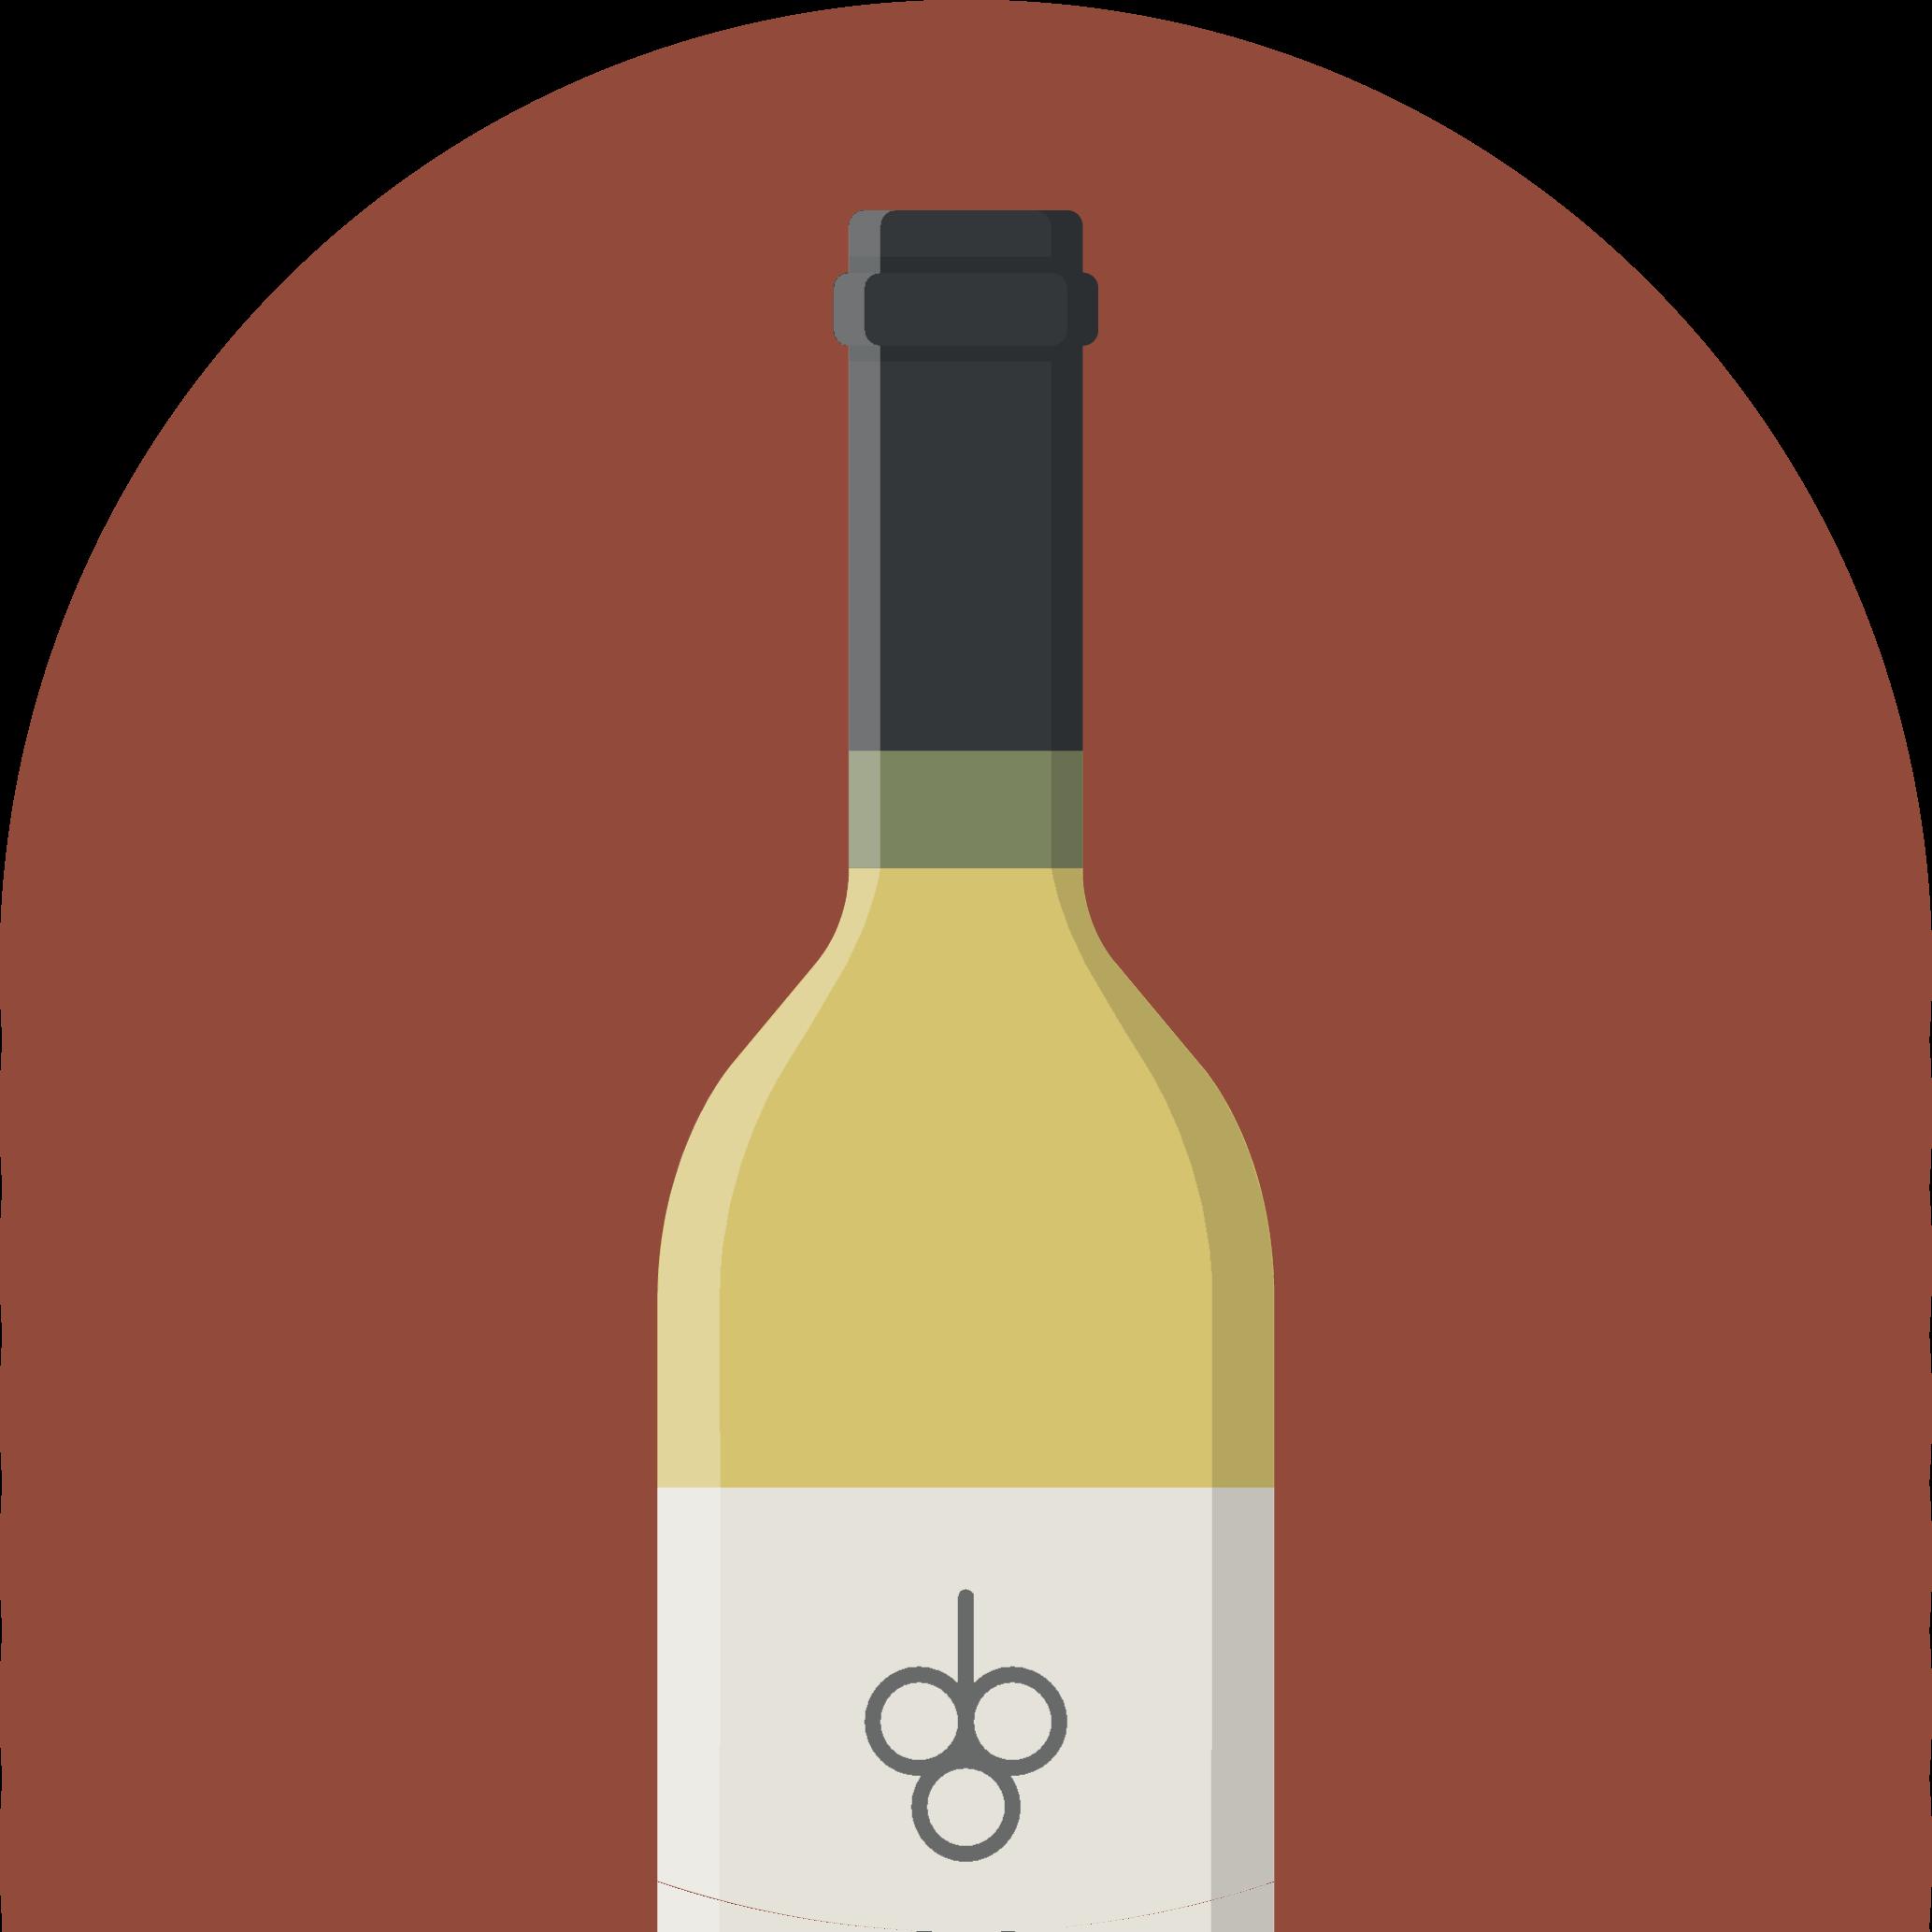 James charles winery vineyard. Drinking clipart vintage wine bottle